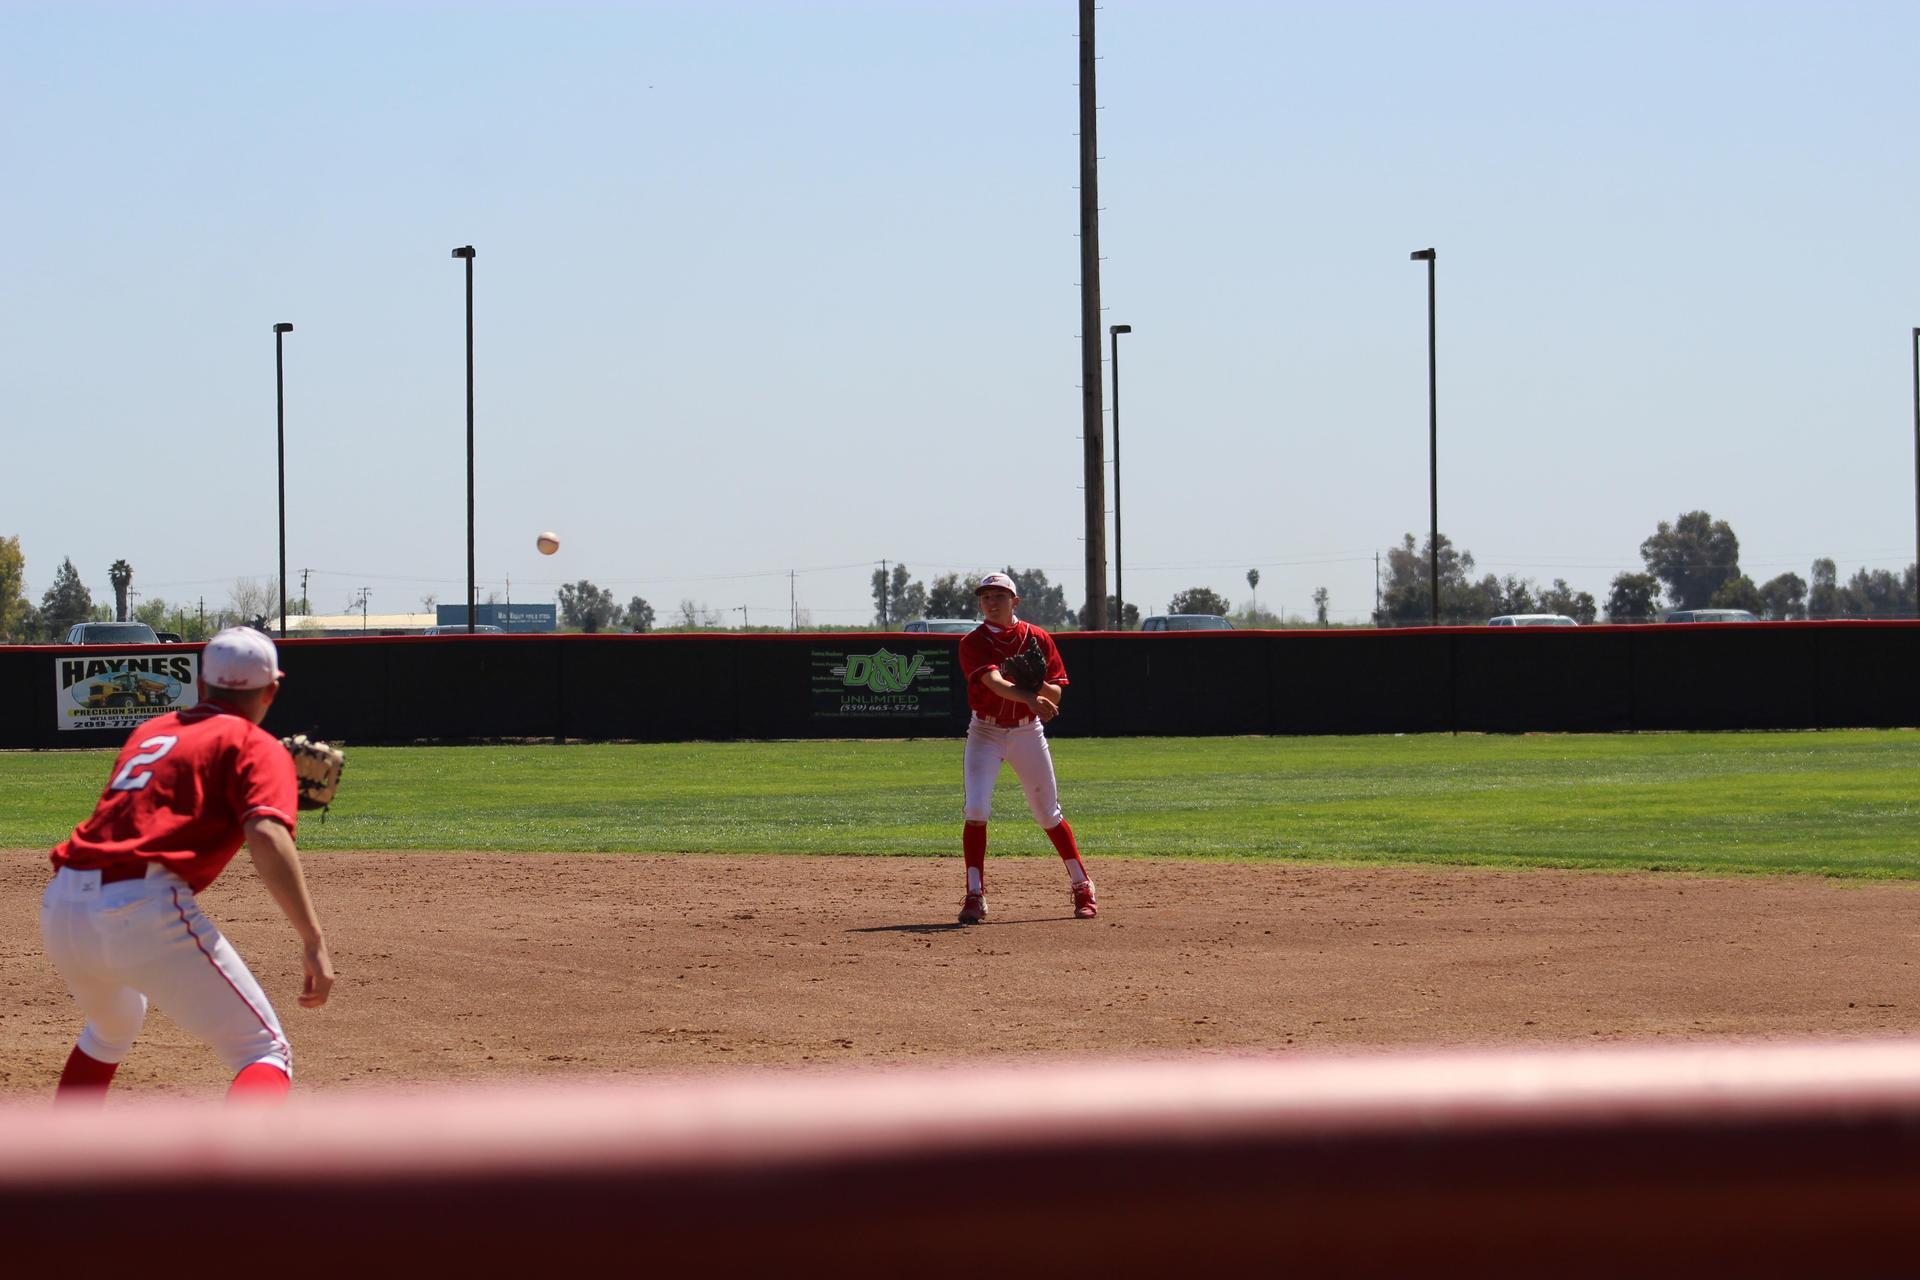 boys playing baseball against San Joaquin Memorial